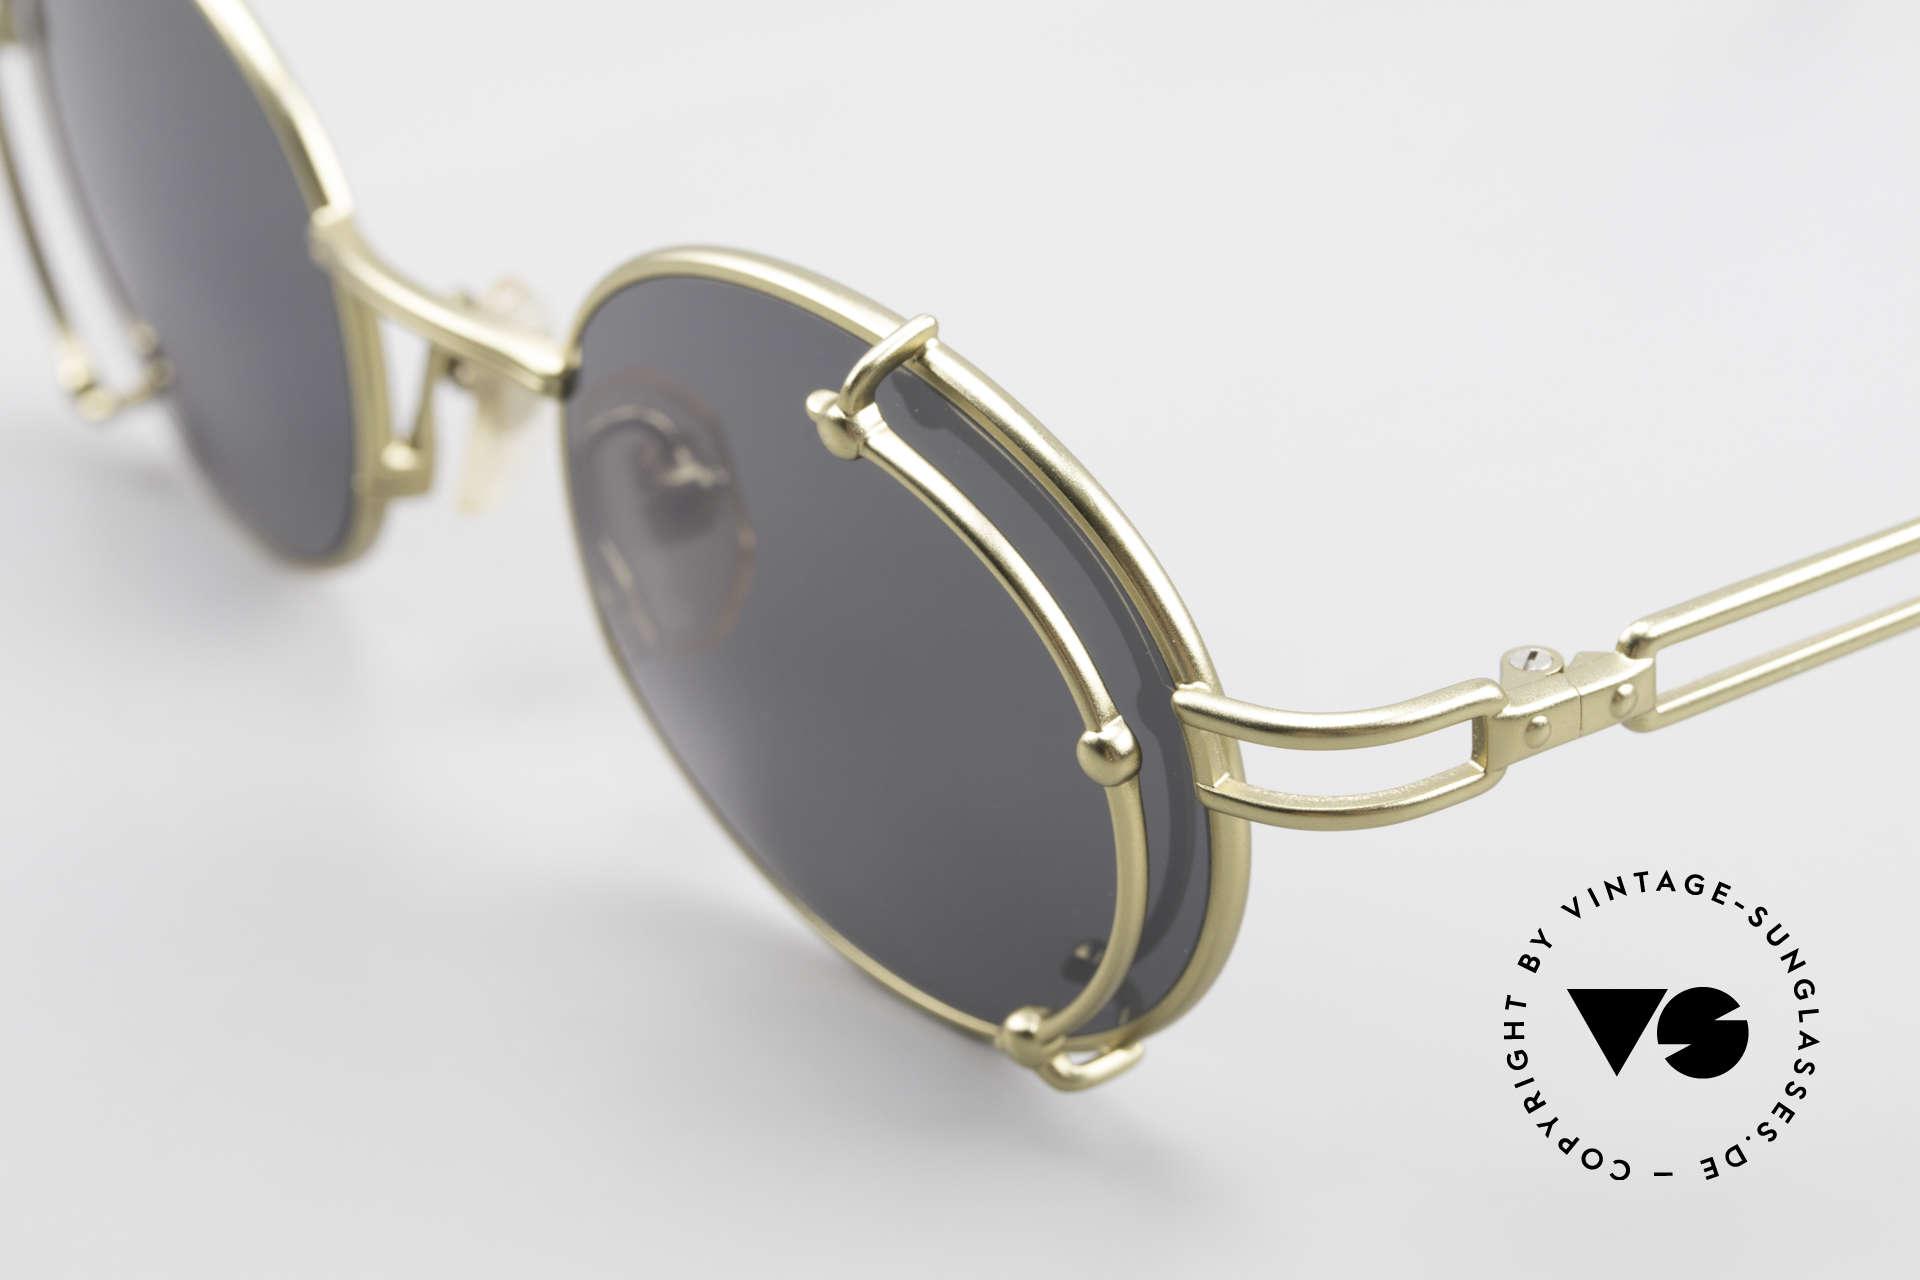 Yohji Yamamoto 52-4107 Oval 90's Designer Sunglasses, unused (like all our Haute Couture designer sunglasses), Made for Men and Women